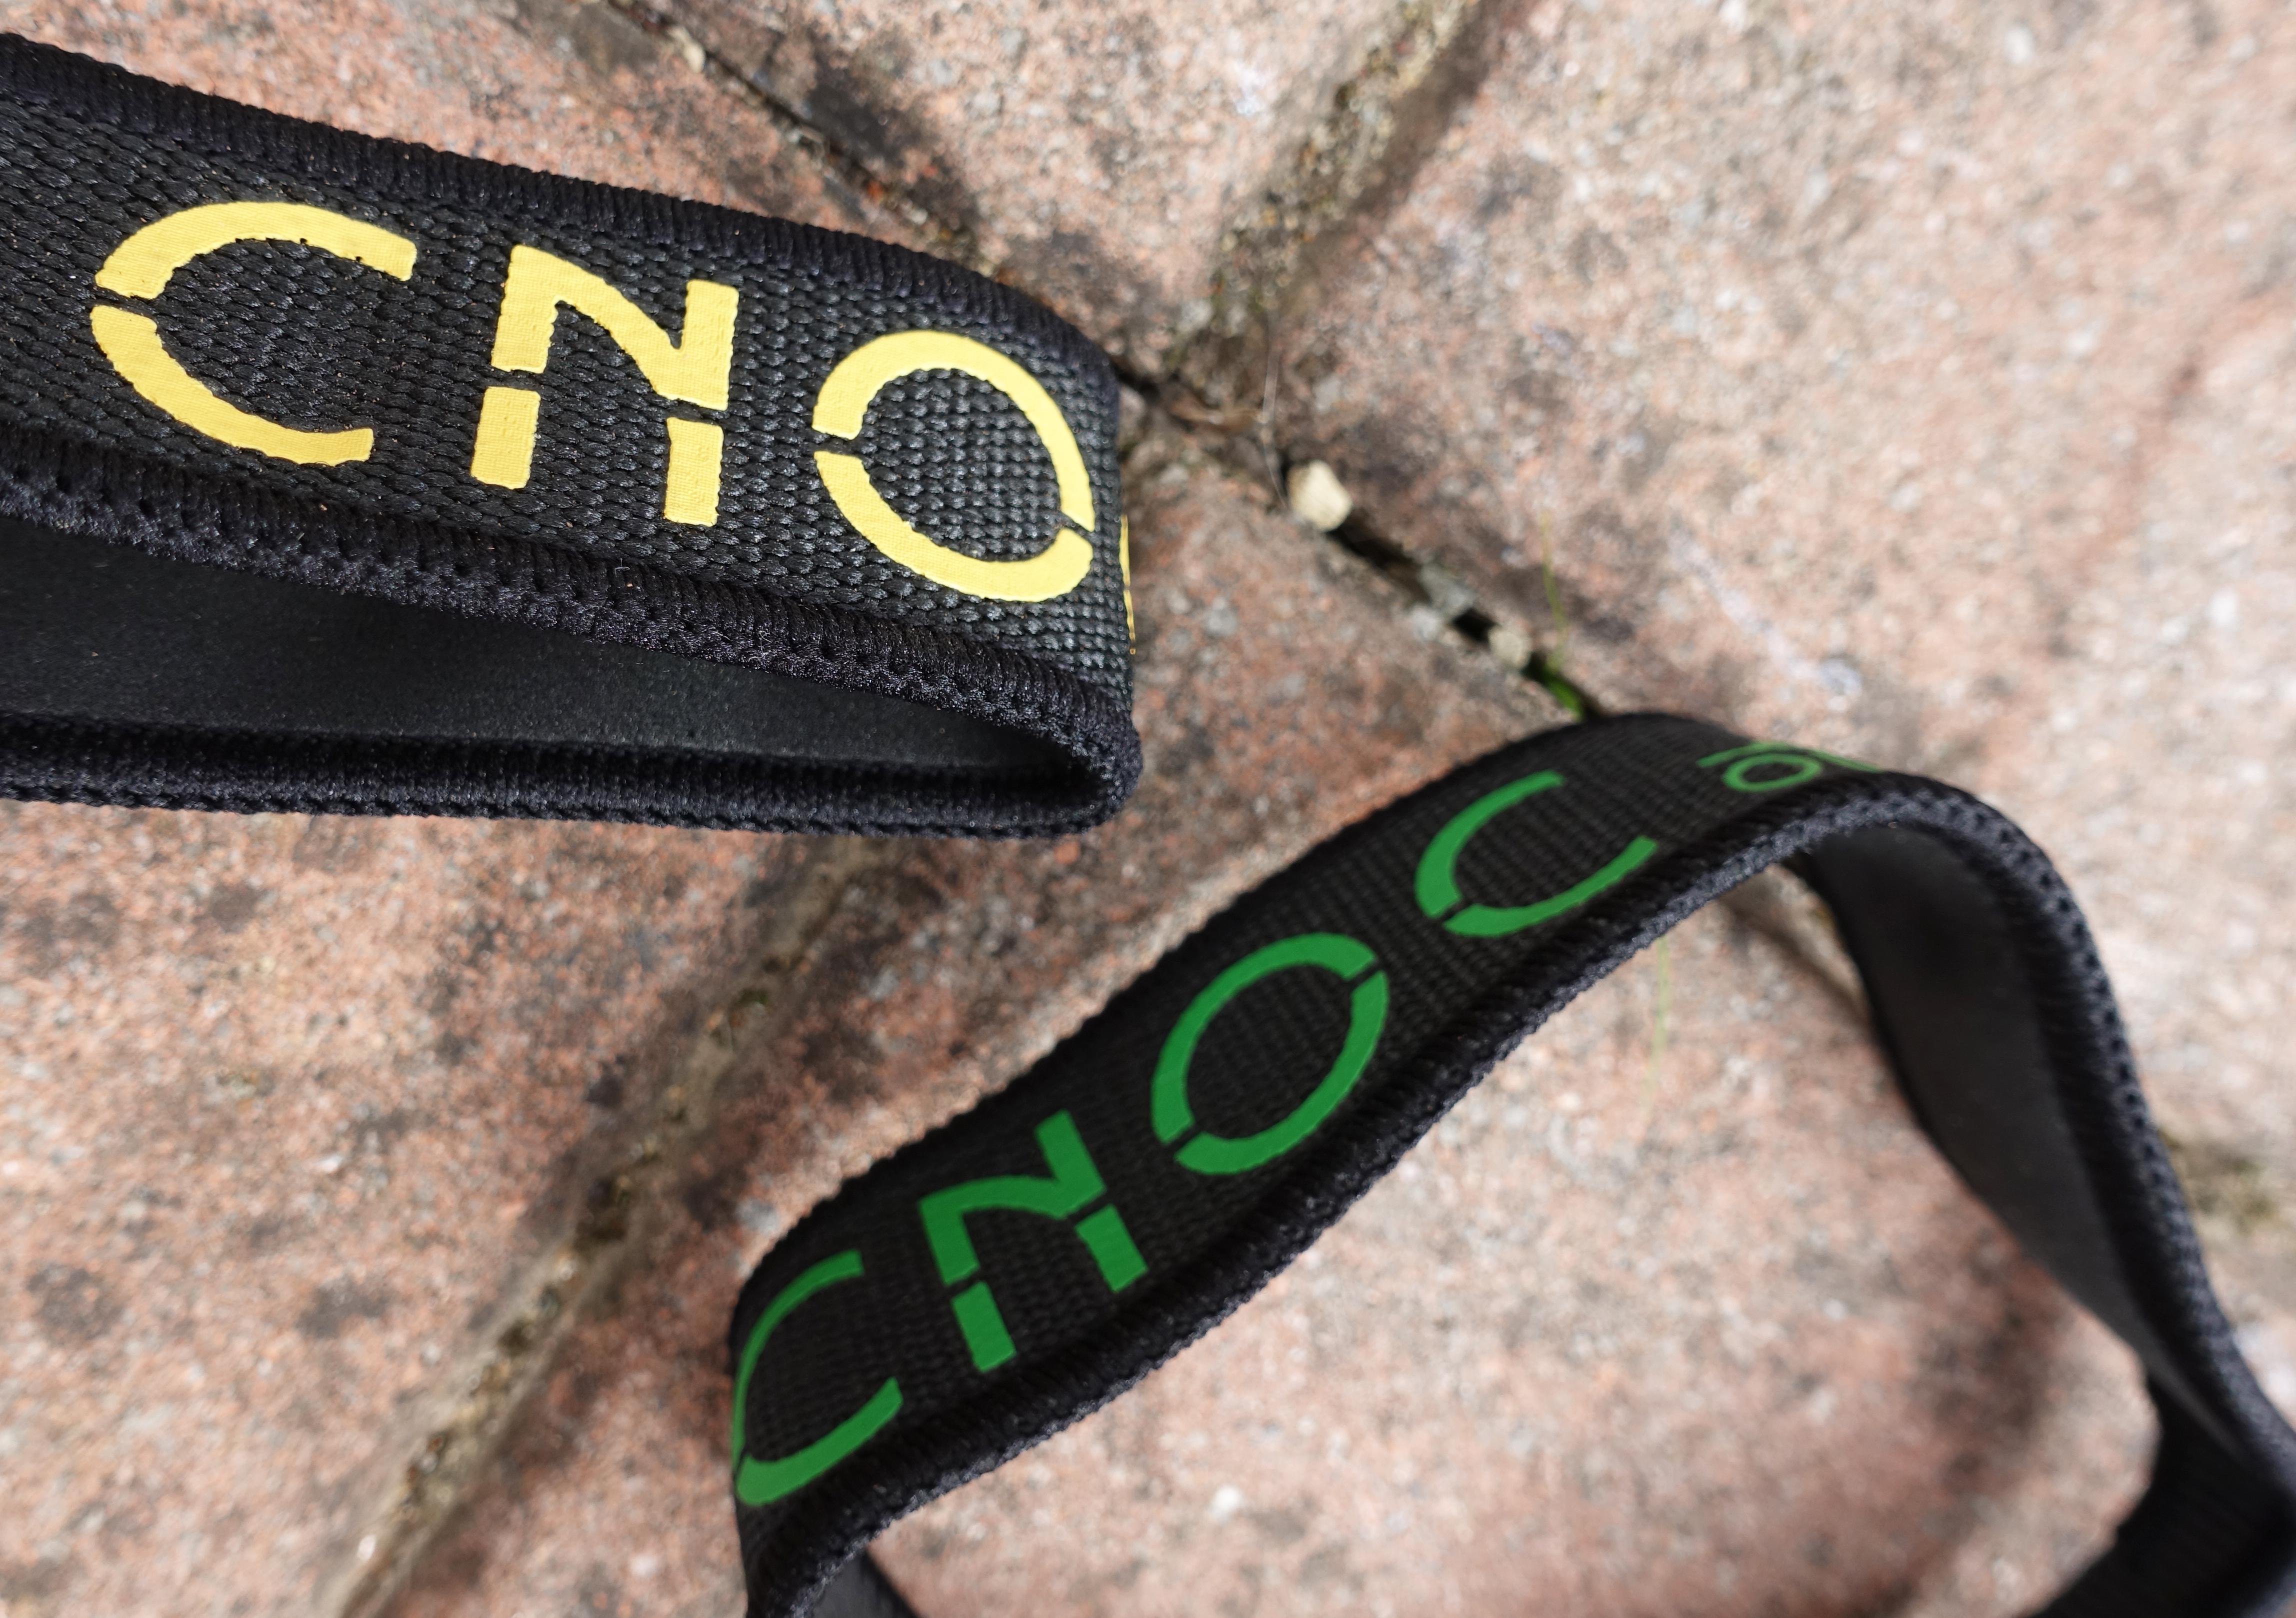 'Handed' straps